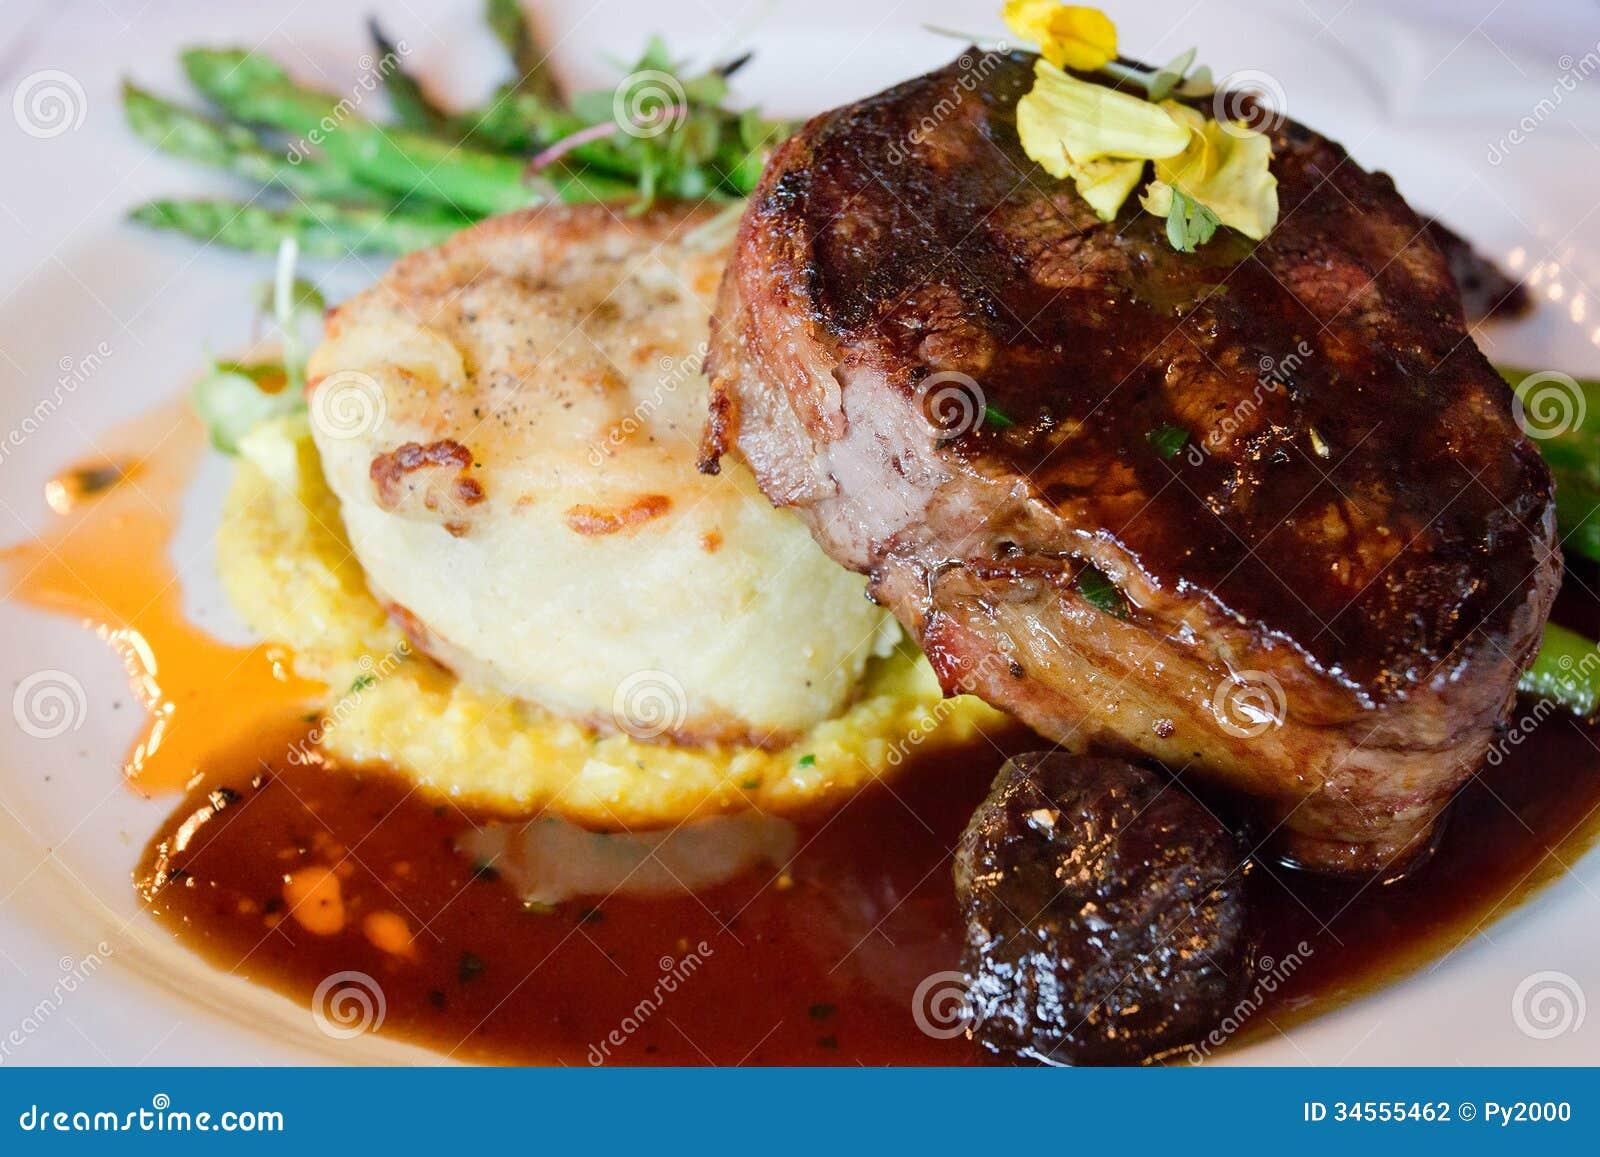 Beef Tenderloin Steak Dinner